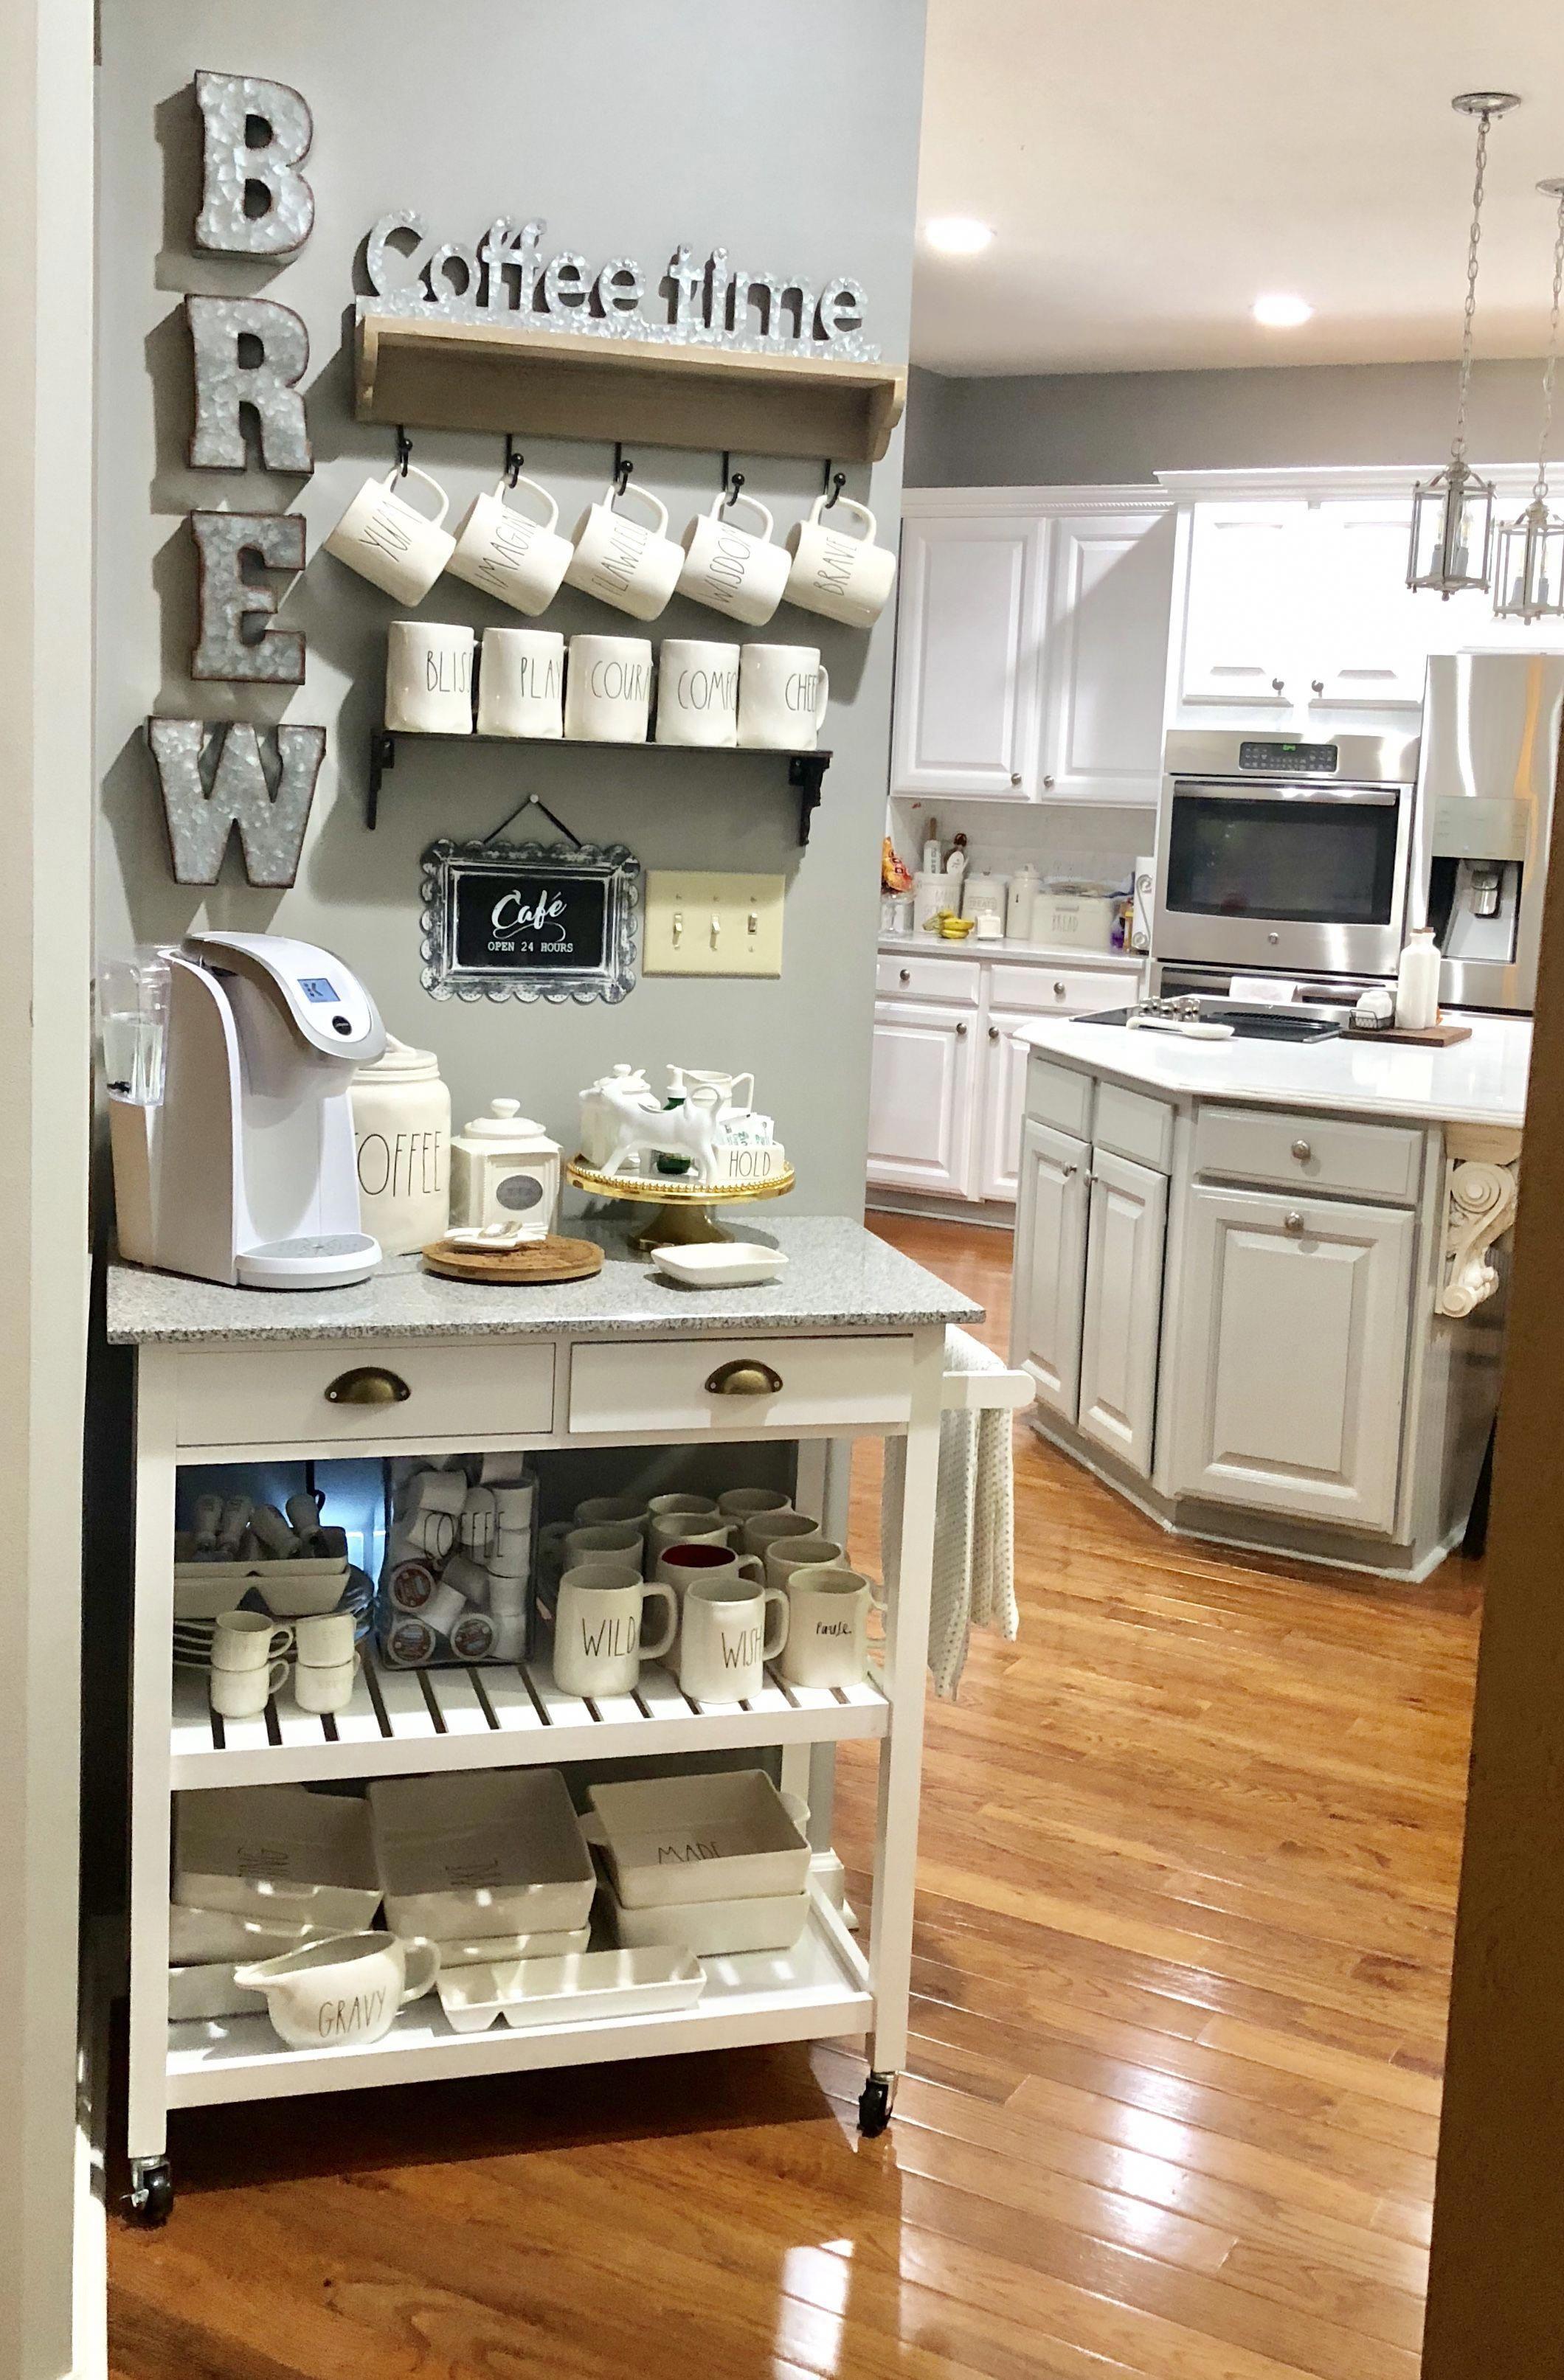 10x10 Bedroom Layout Ikea: Kitchen Renovation, Kitchen Design